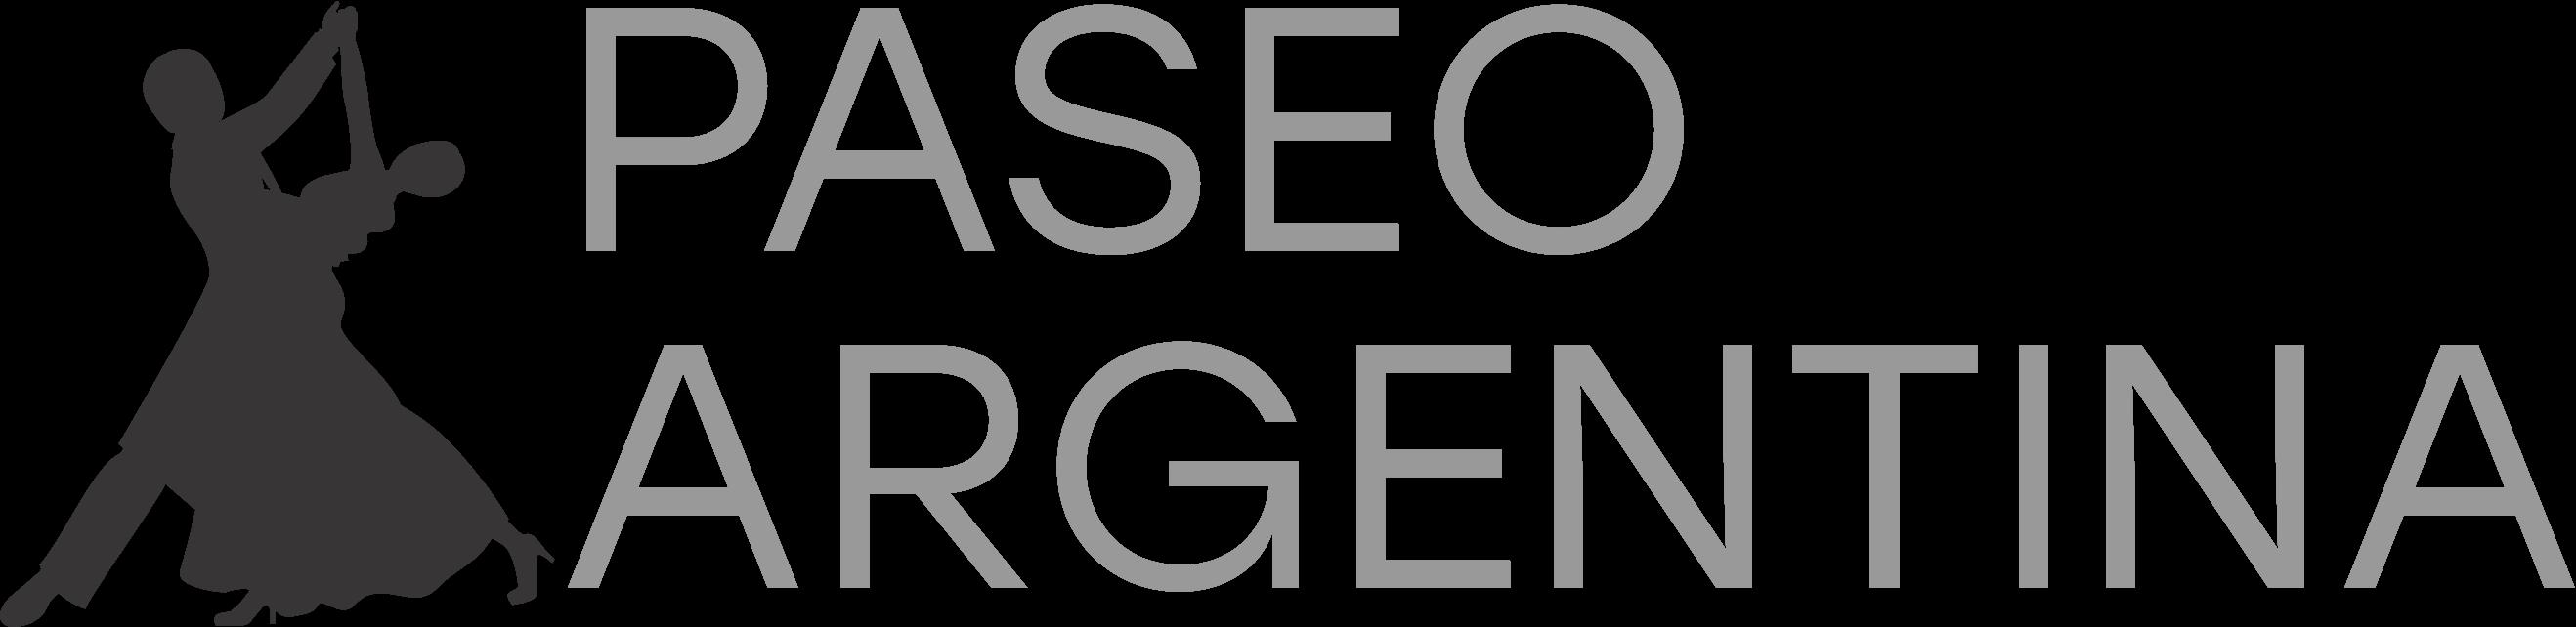 Paseo Argentina | Travel Technology Partner